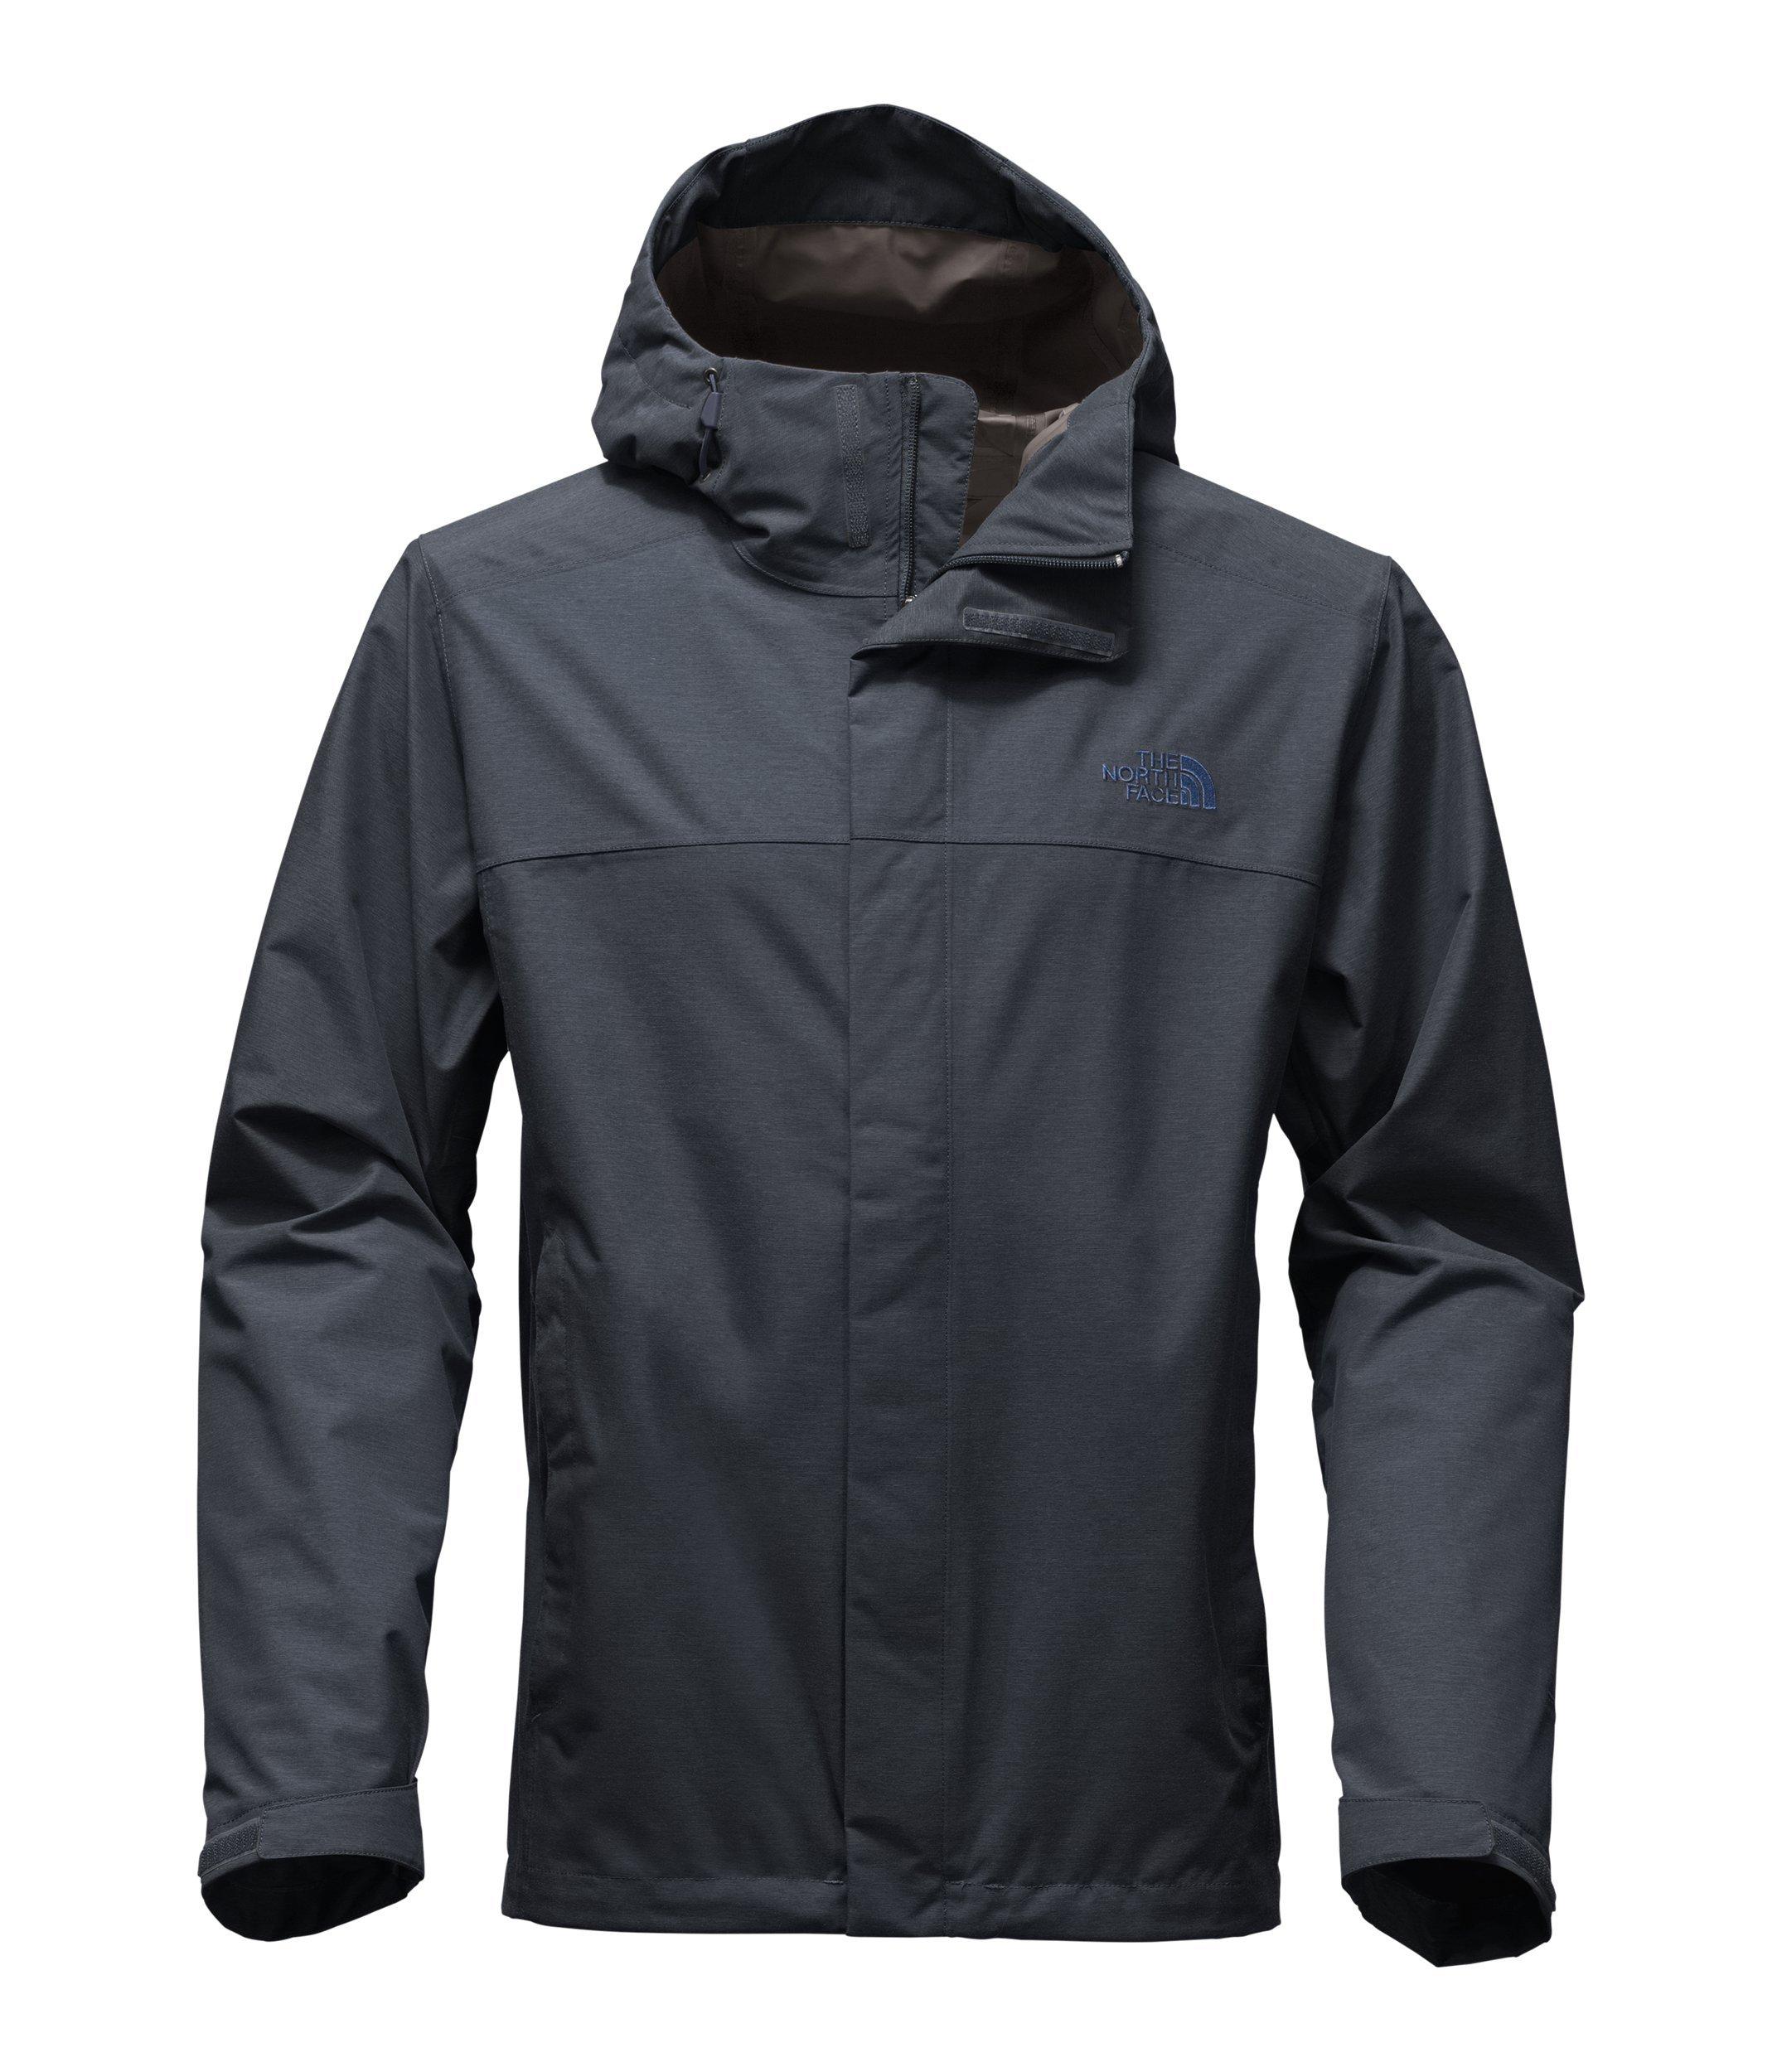 The North Face Men's Venture 2 Jacket - Urban Navy Heather - M